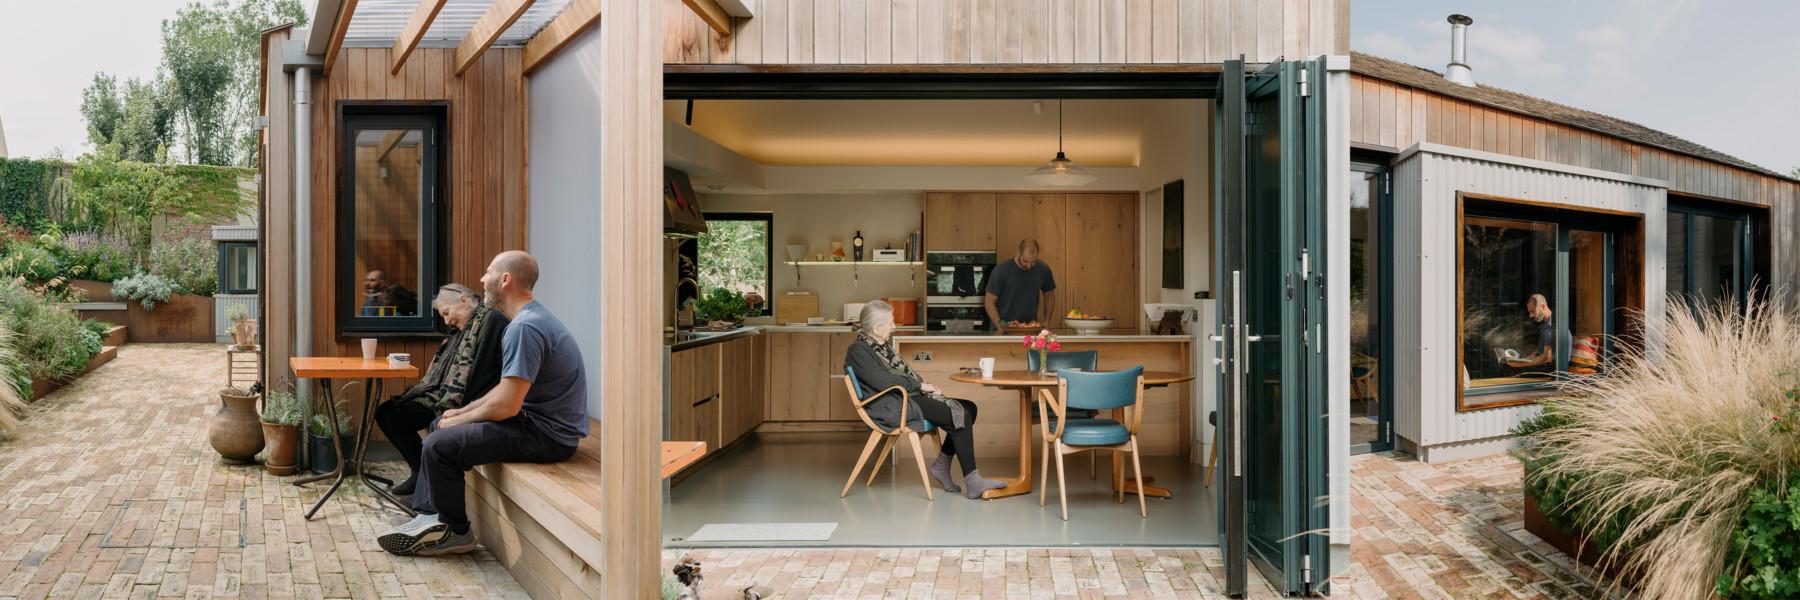 Sarah-Wigglesworth-Architects Sustainable Housing Haycroft Gardens